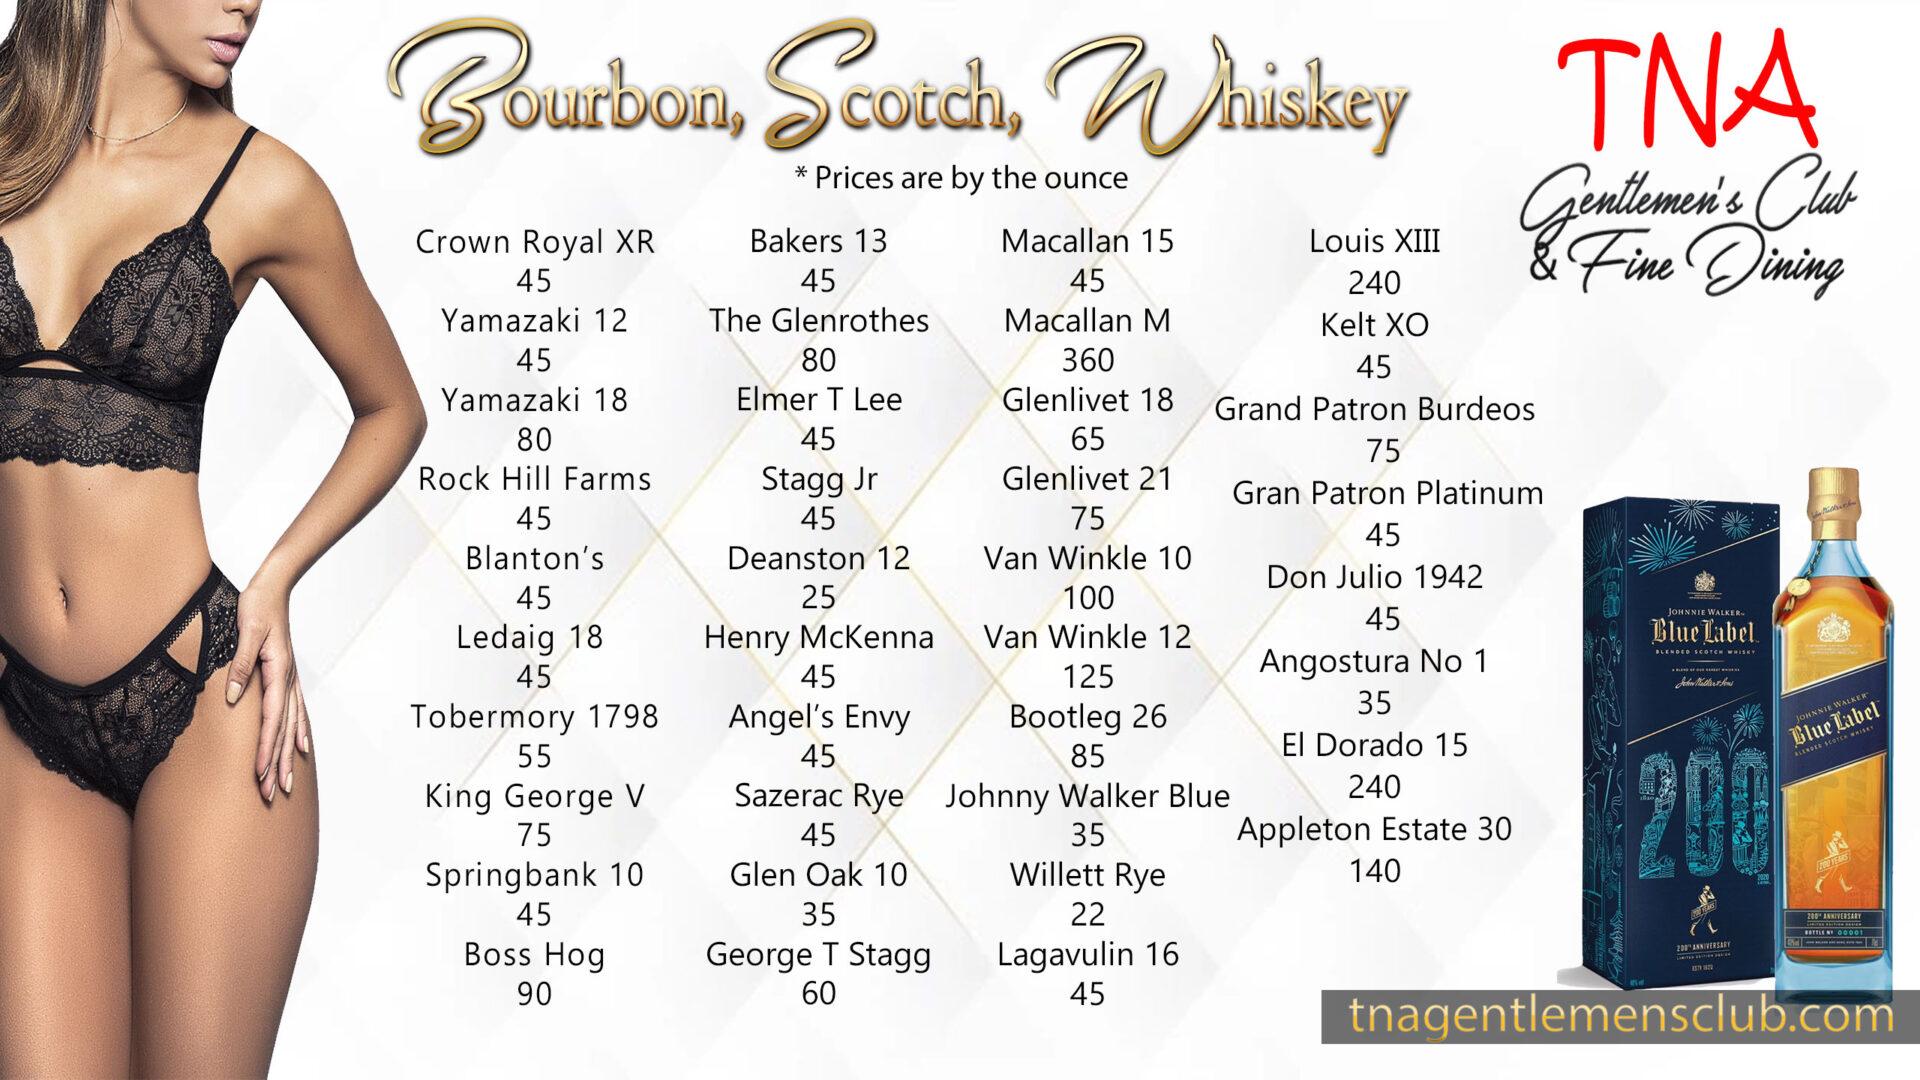 Bourbon scotch whiskey menu-Recovered